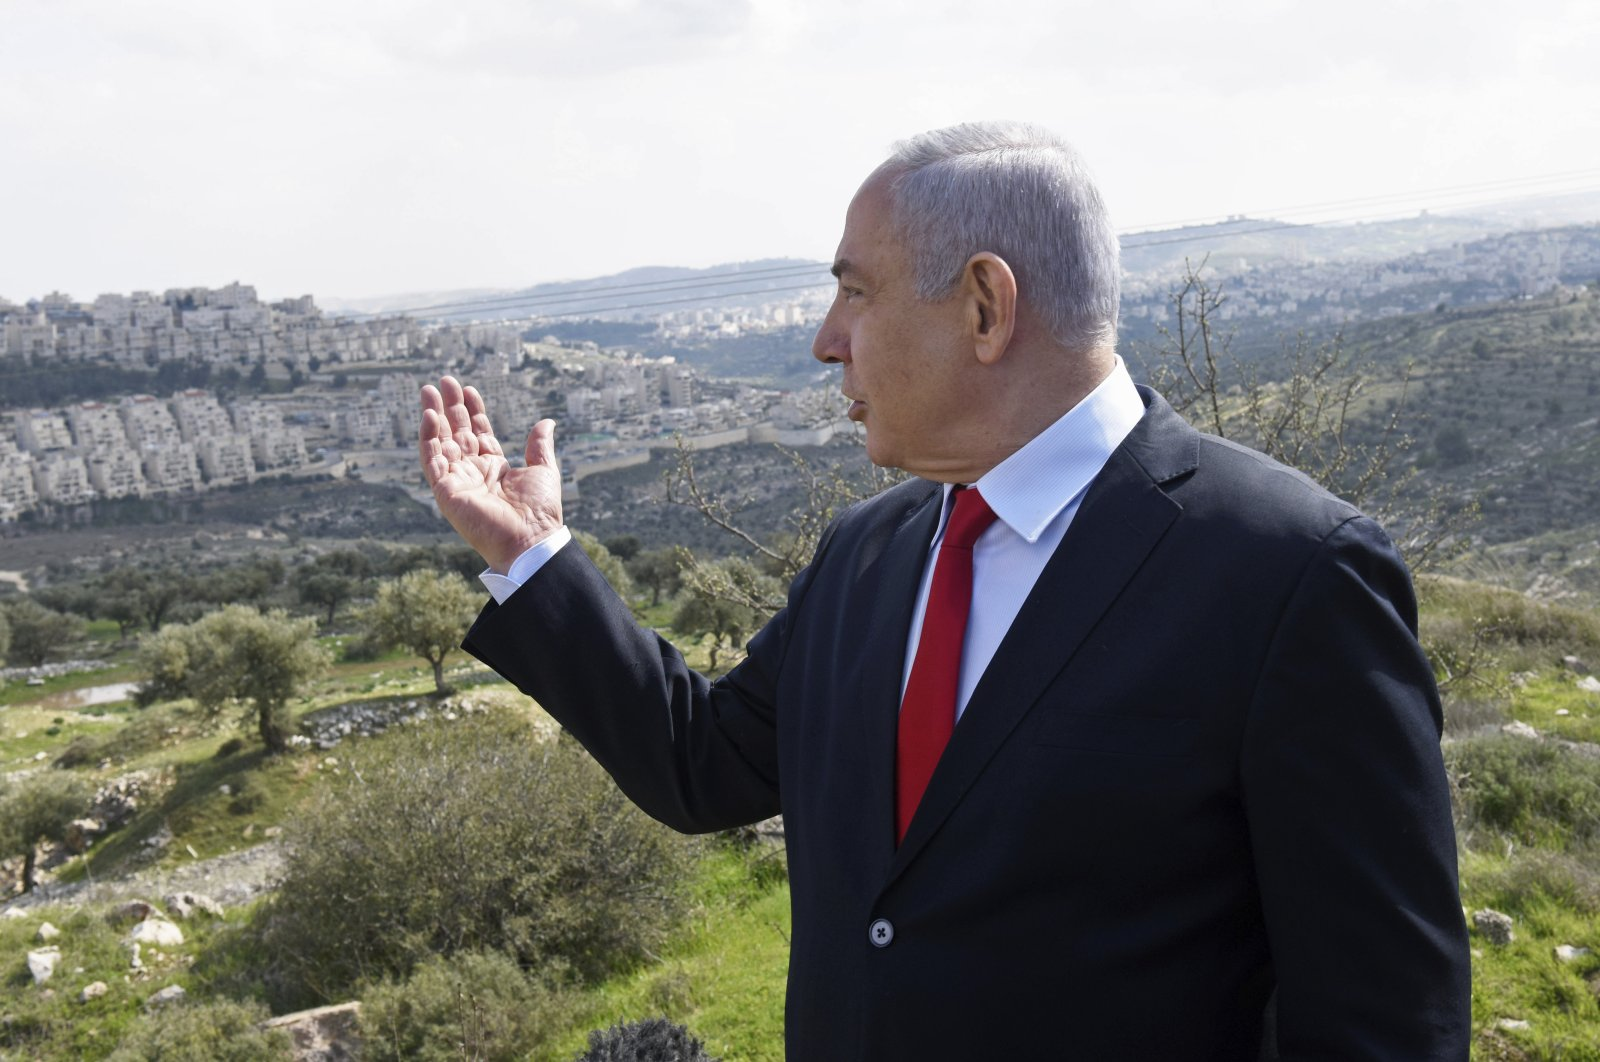 Israeli Prime Minister Benjamin Netanyahu visits the area where a new neighborhood is to be built in the east Jerusalem settlement of Har Homa, Israel, Feb. 20, 2020. (AP Photo)